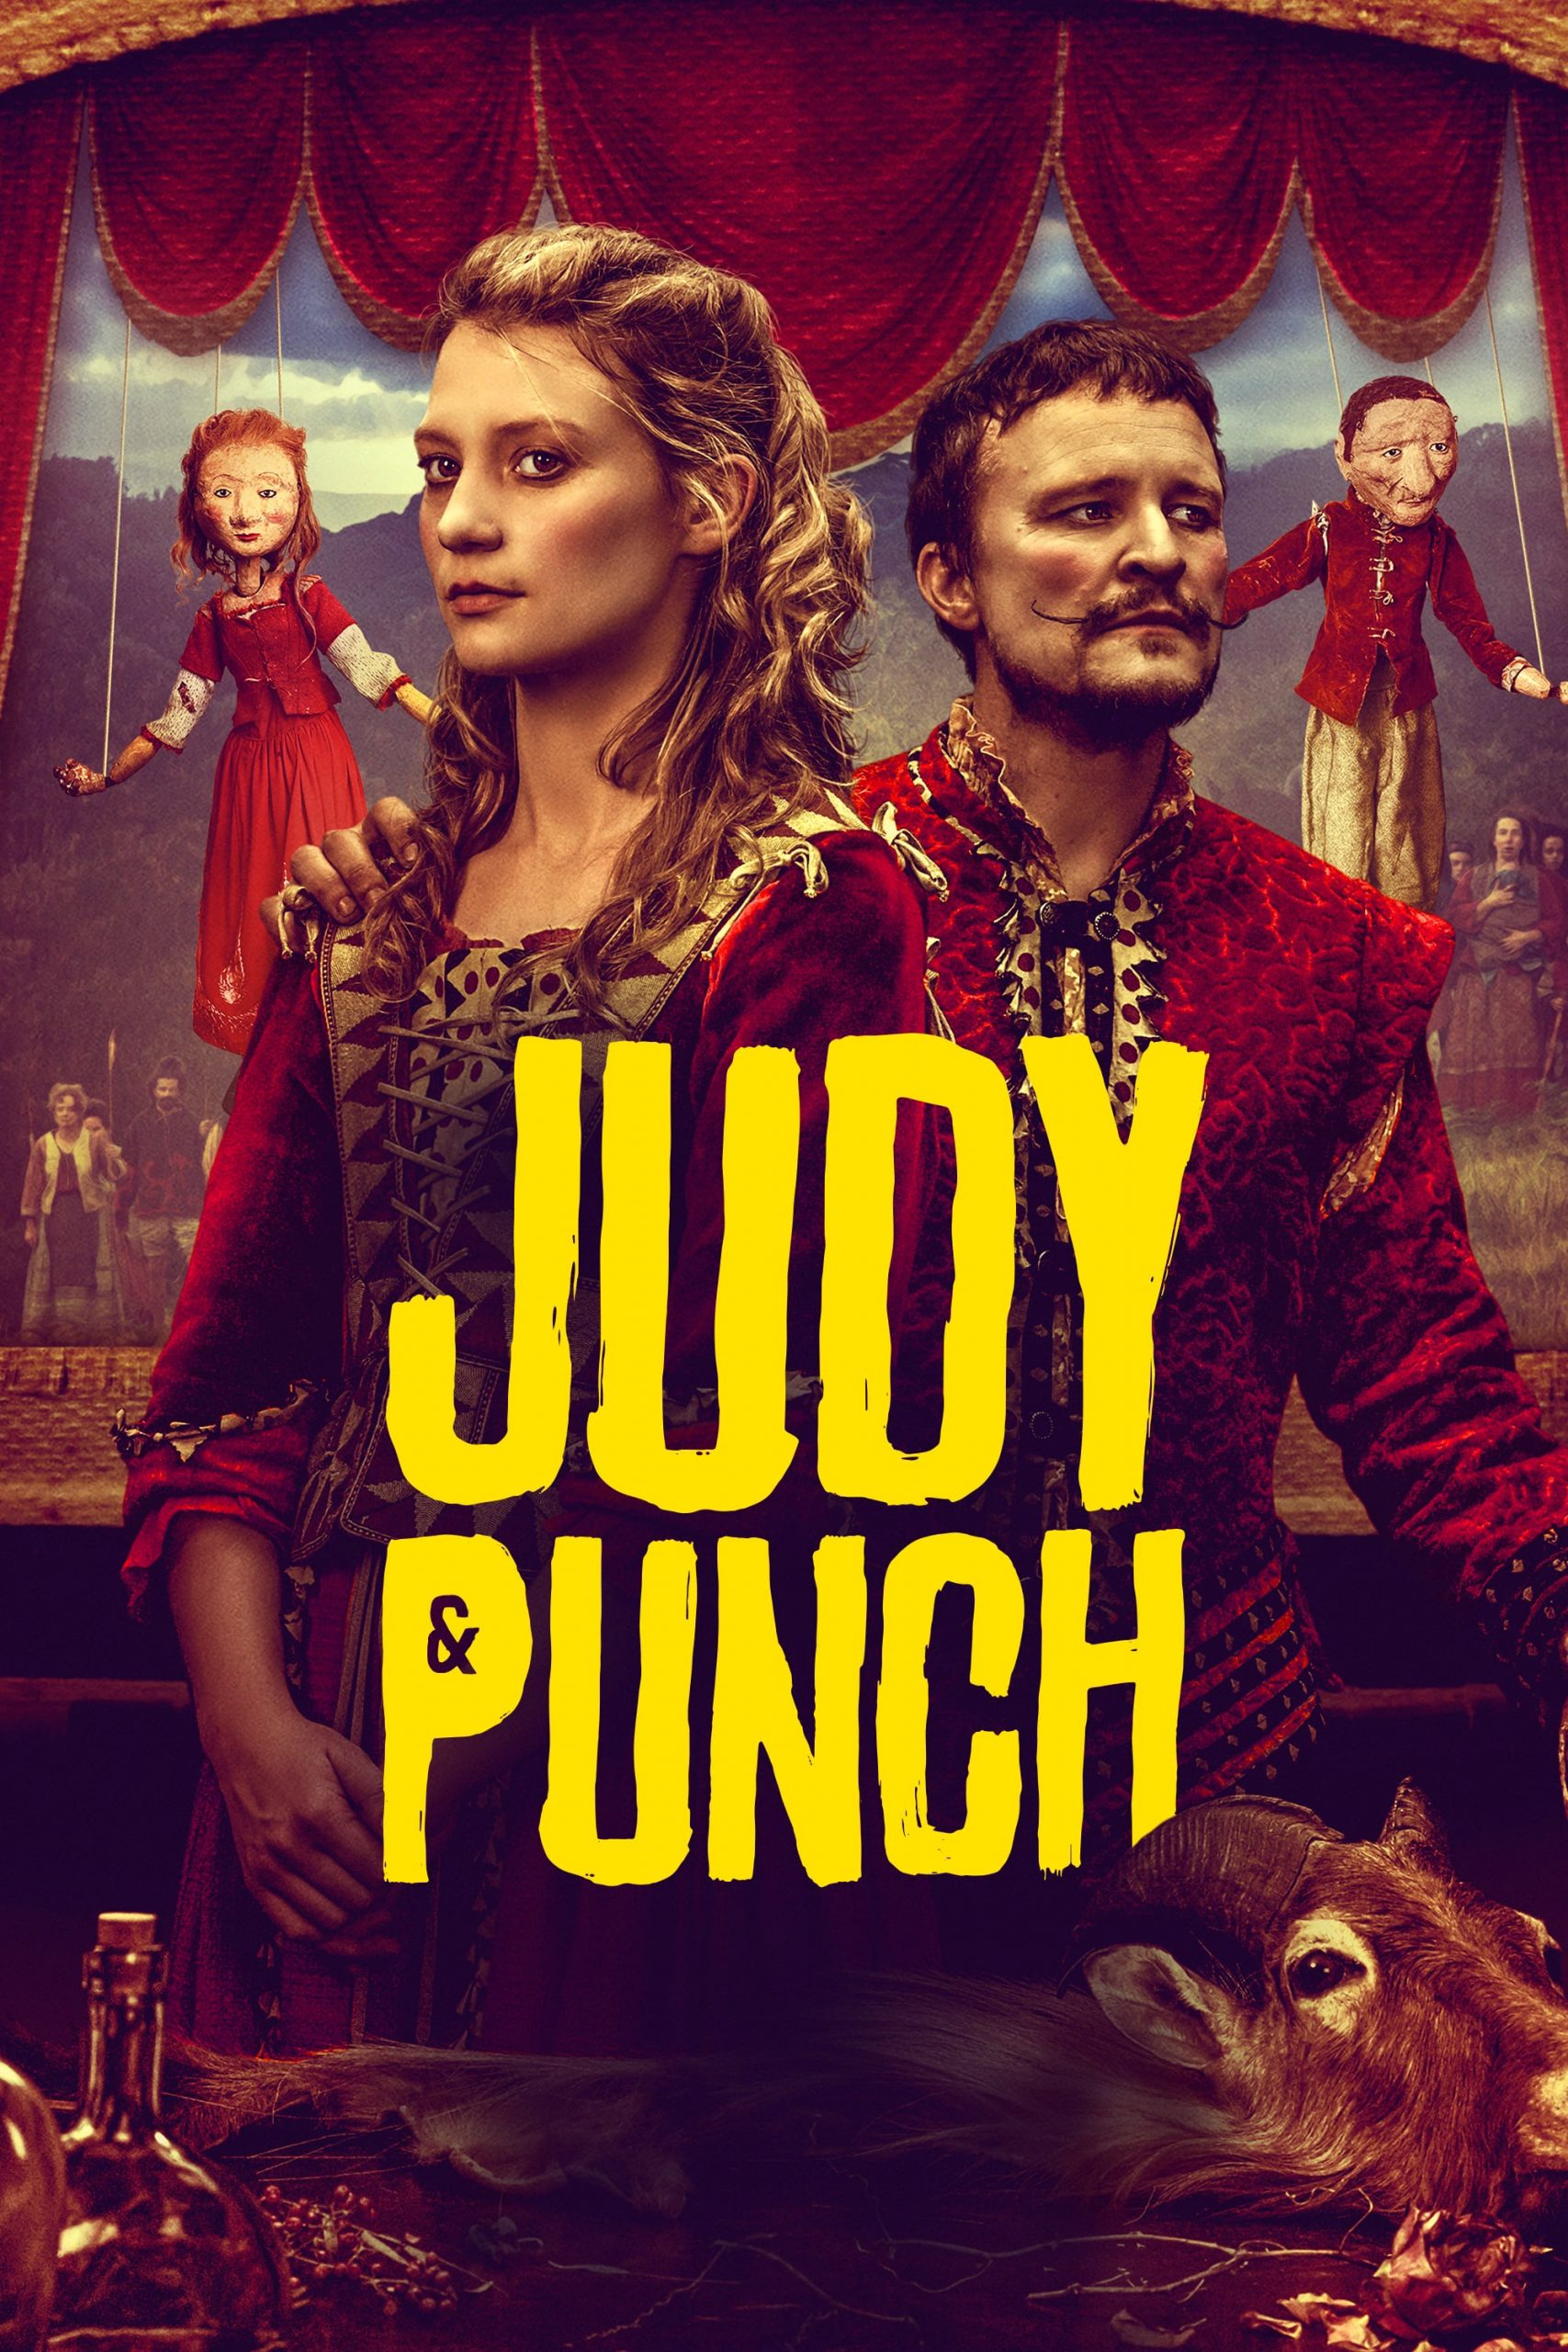 دانلود فیلم Judy & Punch 2019